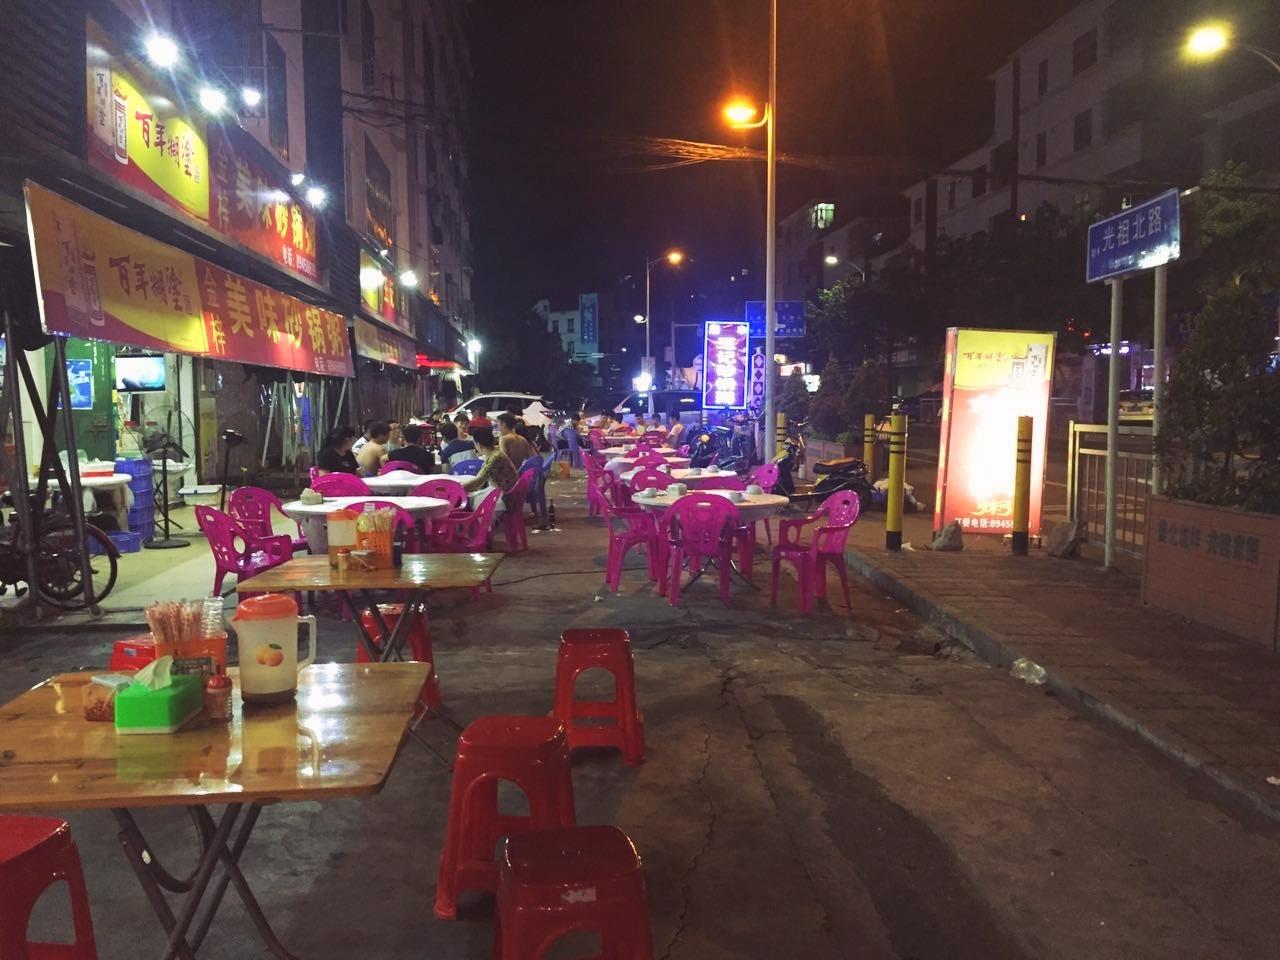 , Pingshan District: Living Beyond the Shenzhen 'Burbs by Tomas Baer, SDE Seadragon Education